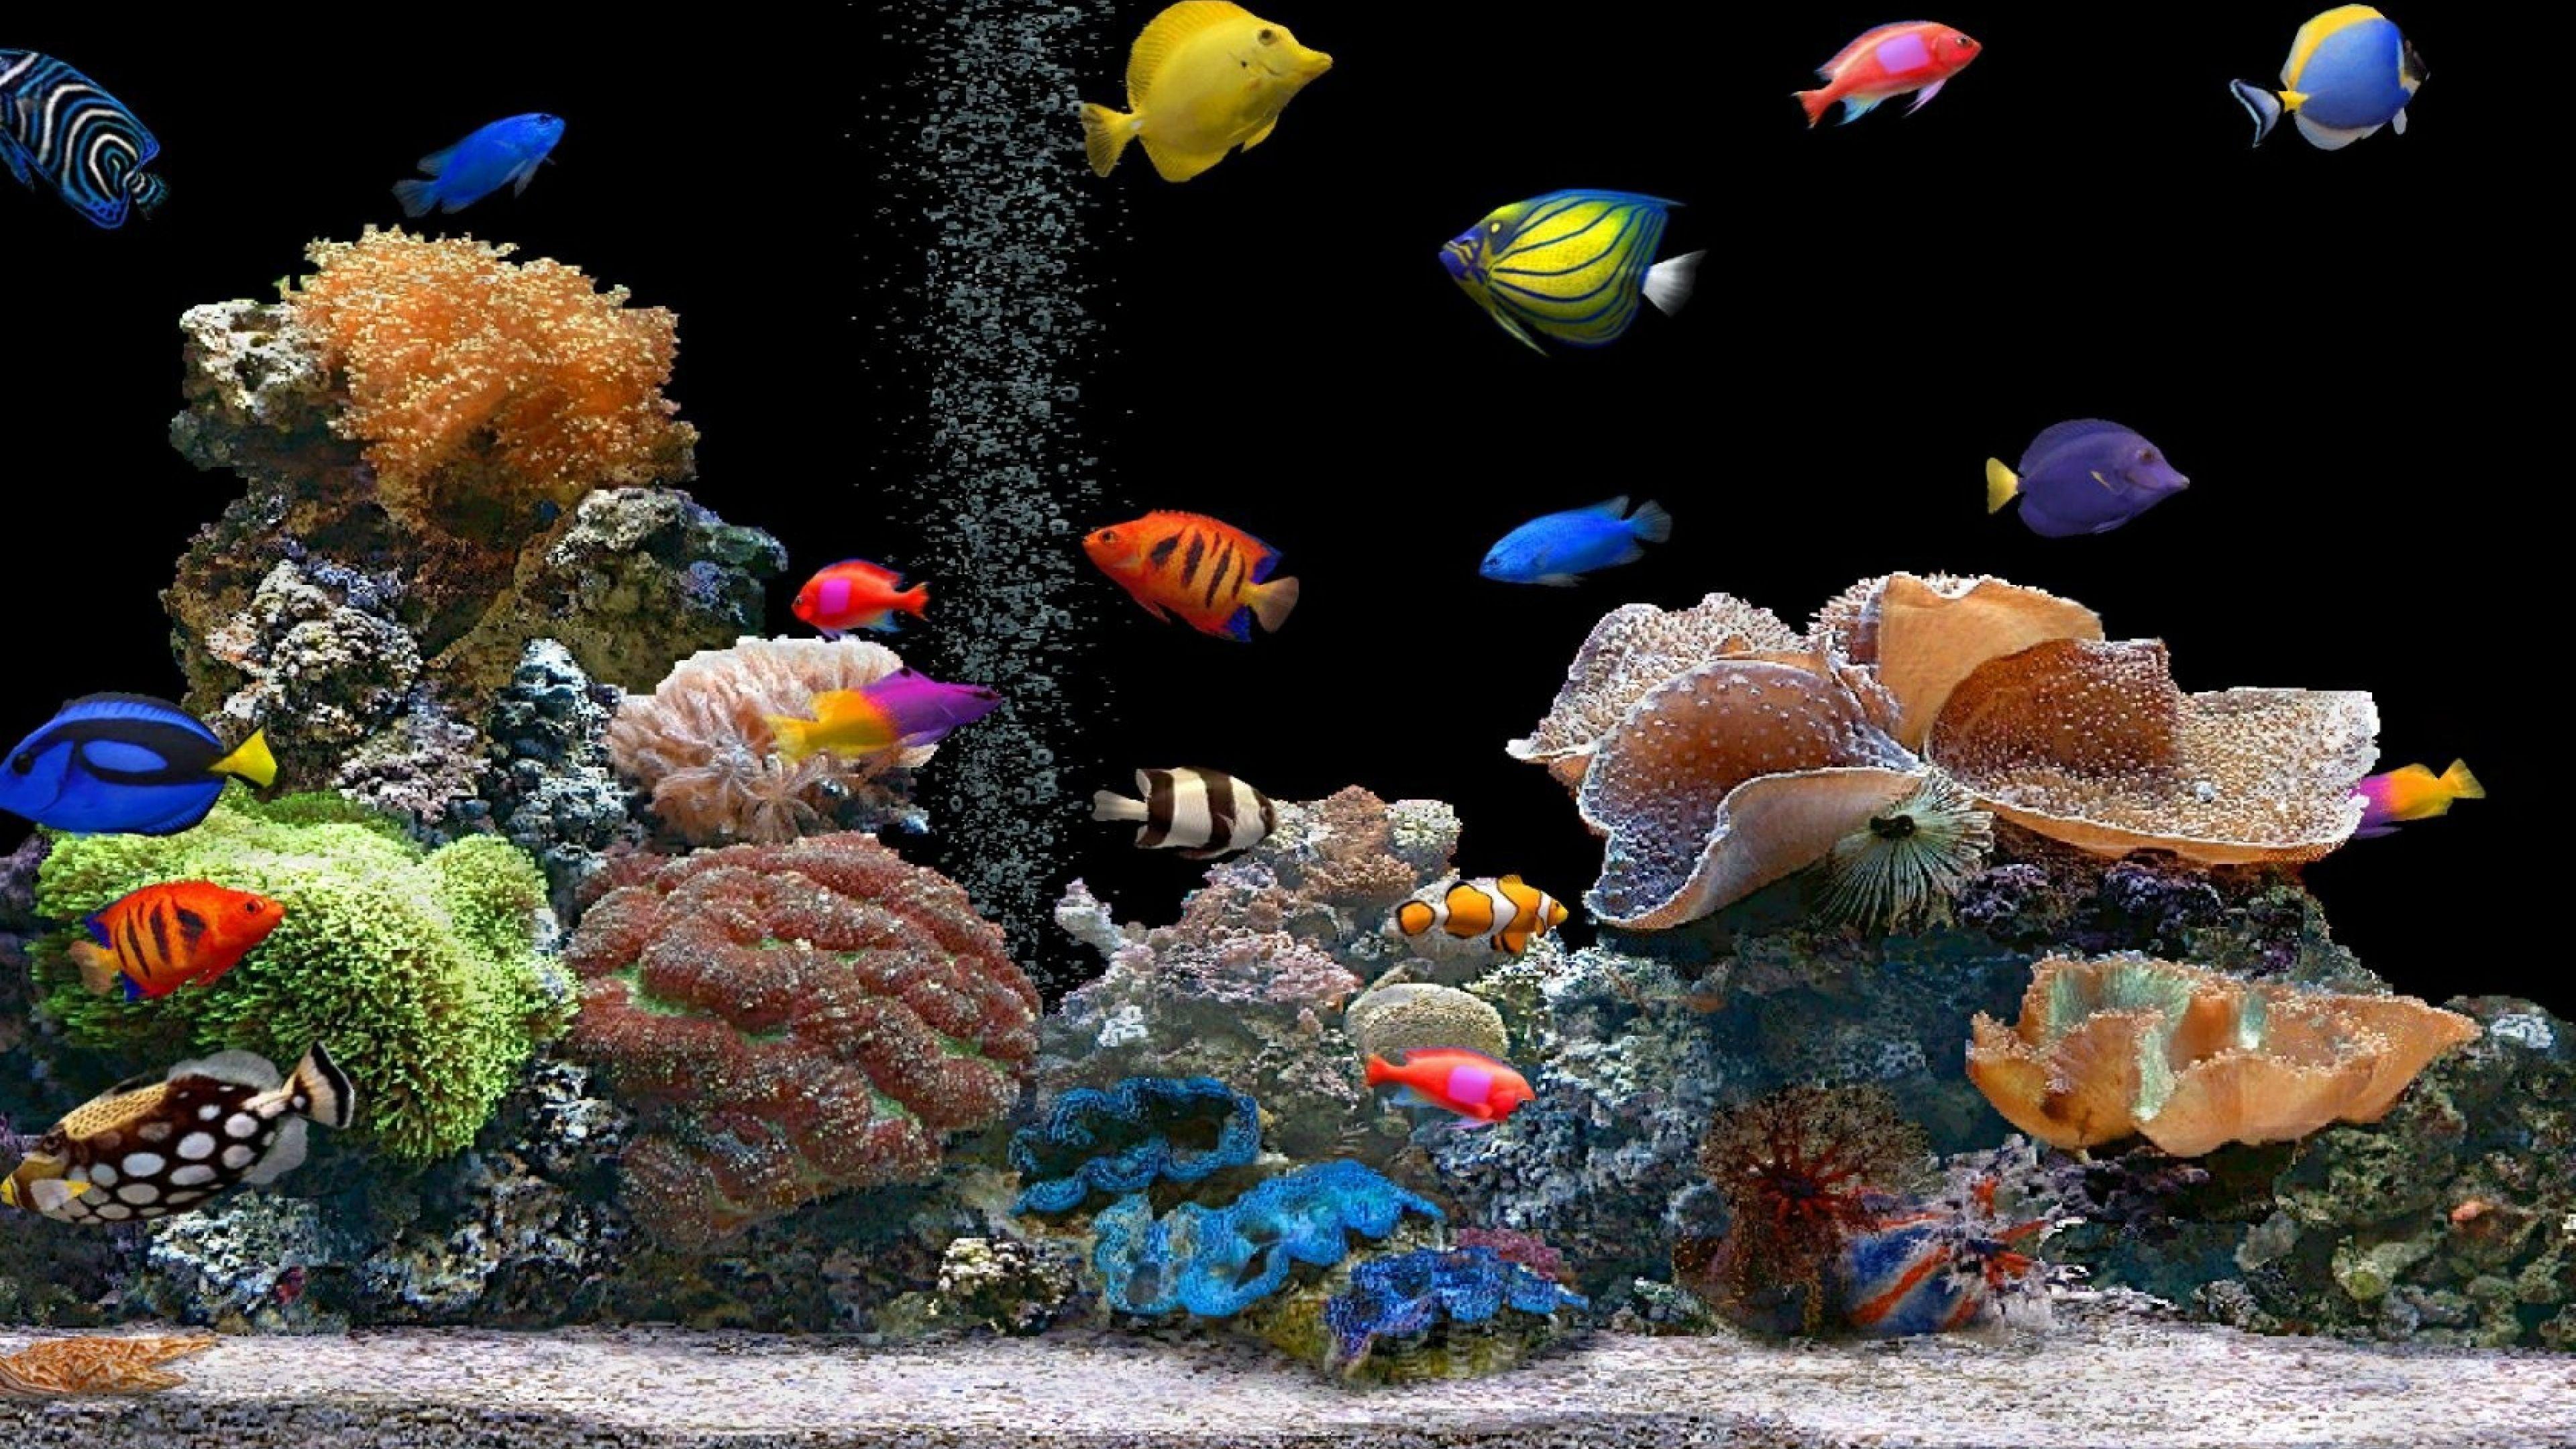 Aquarium 4K UHD Wallpapers - Top Free